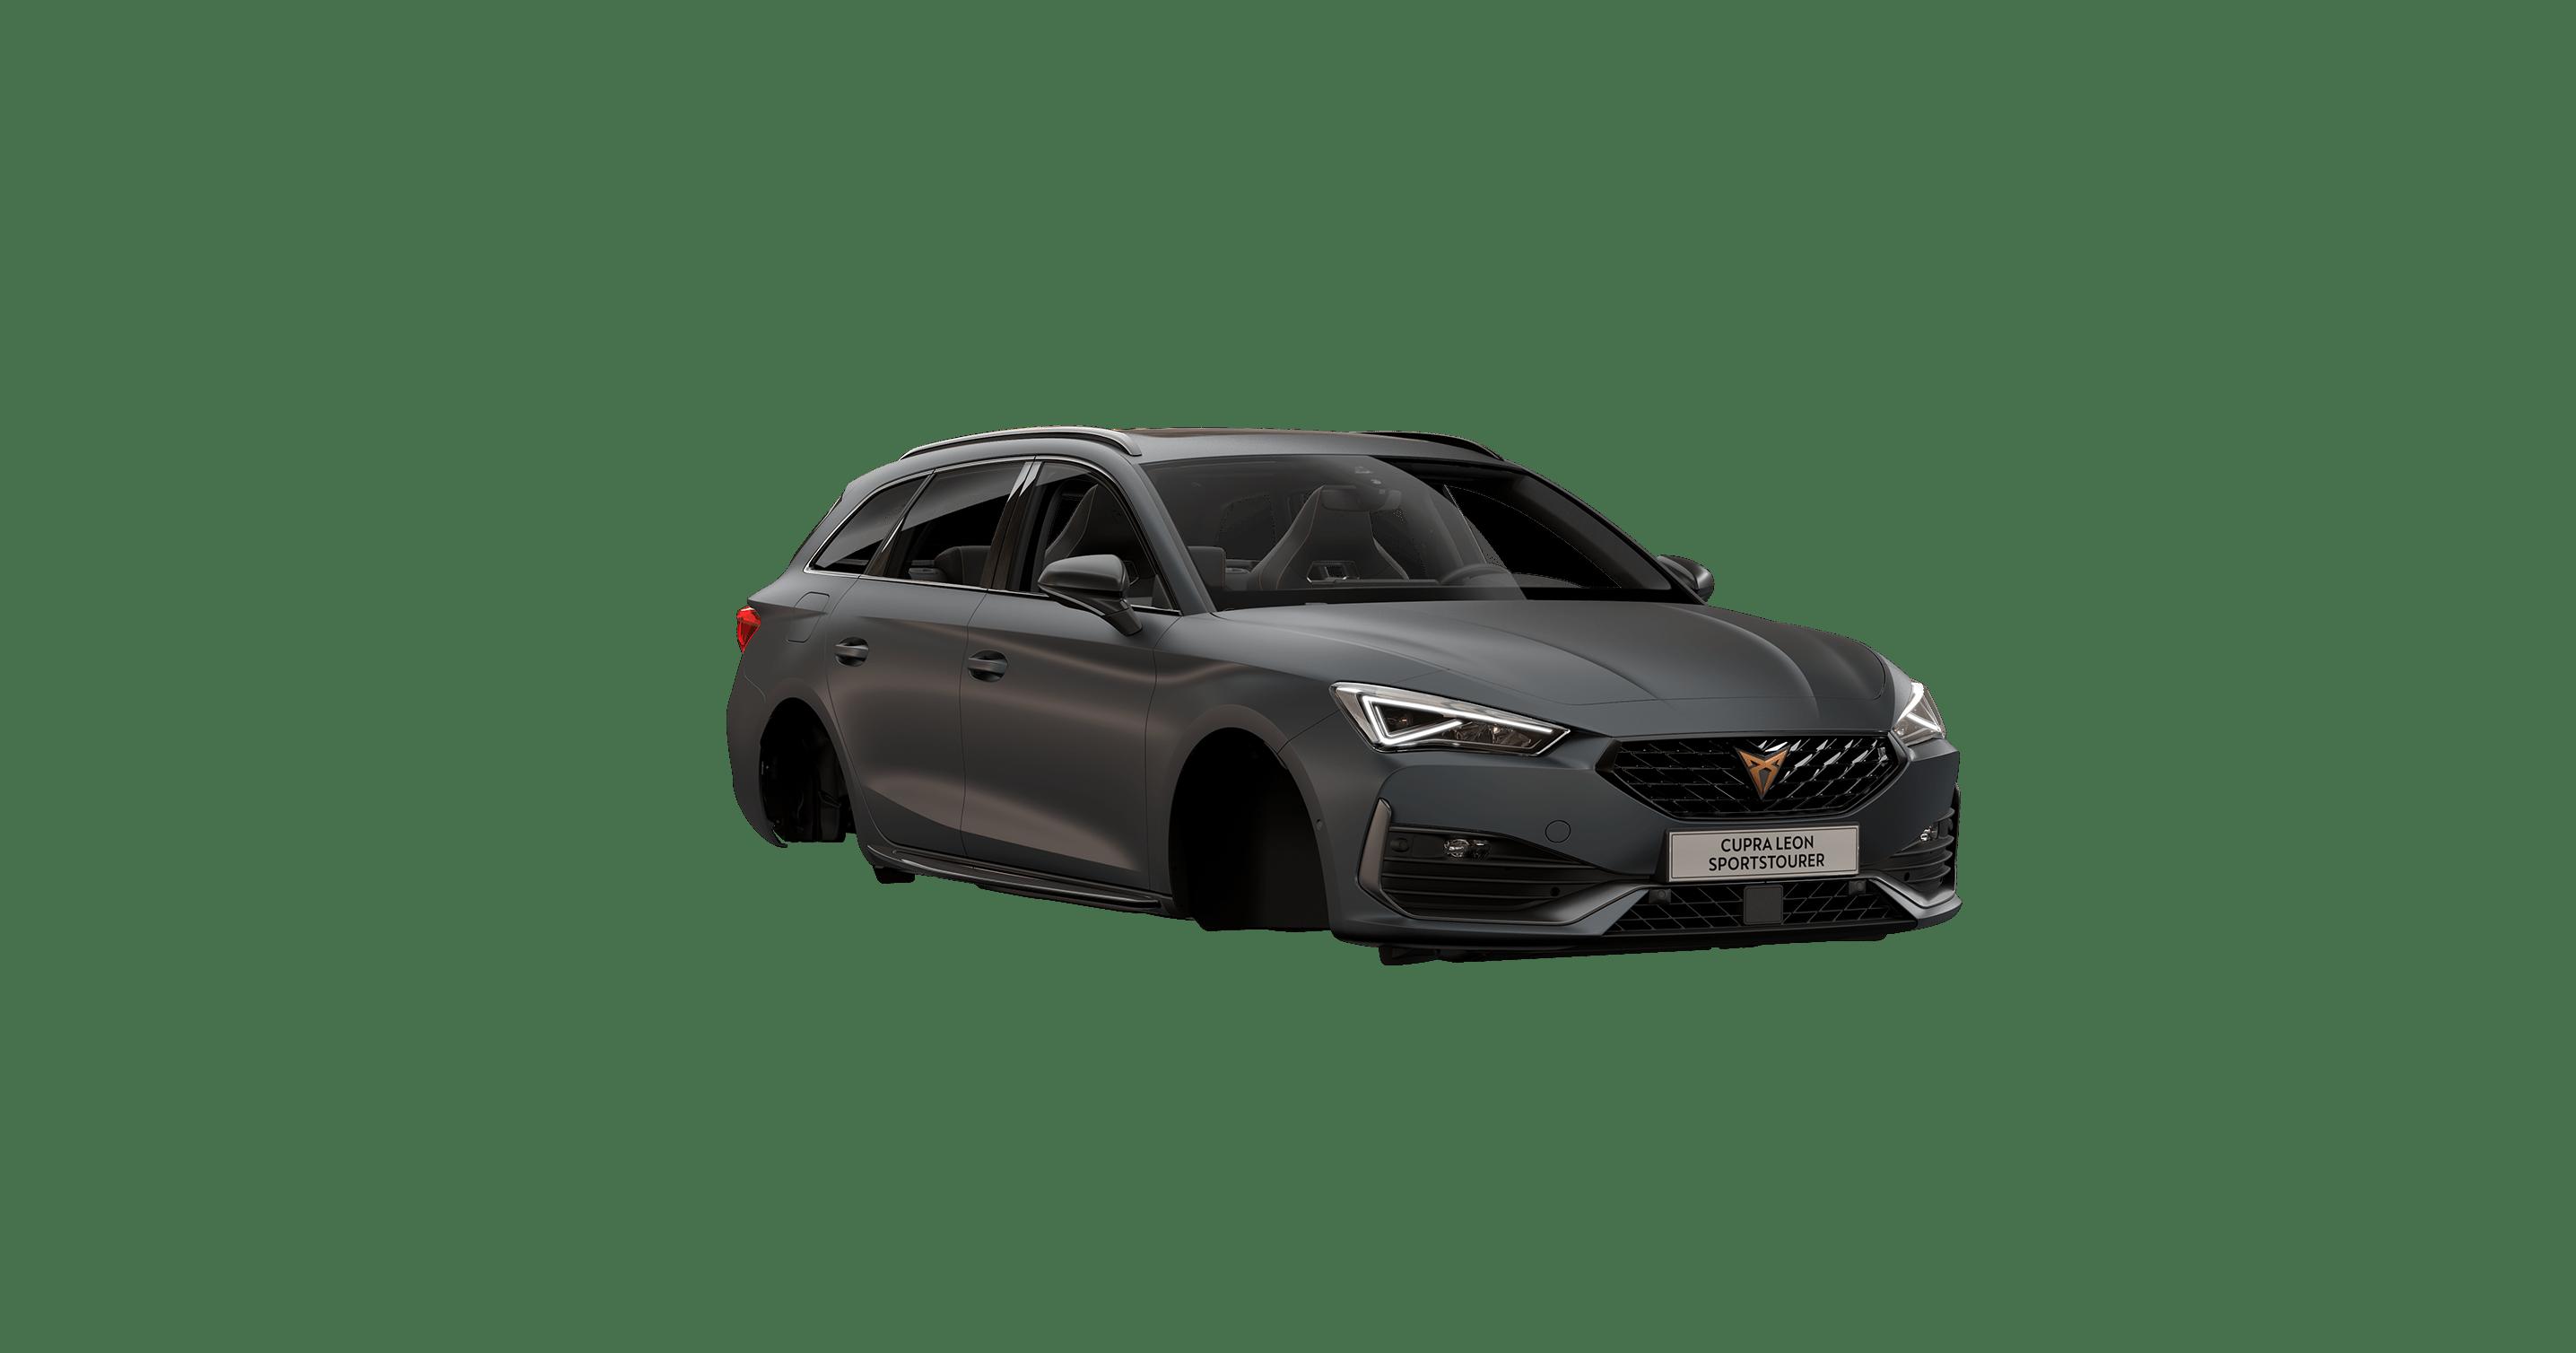 new CUPRA Leon Sportstourer ehybrid Family Sports Car available in magnetic tech matte colour